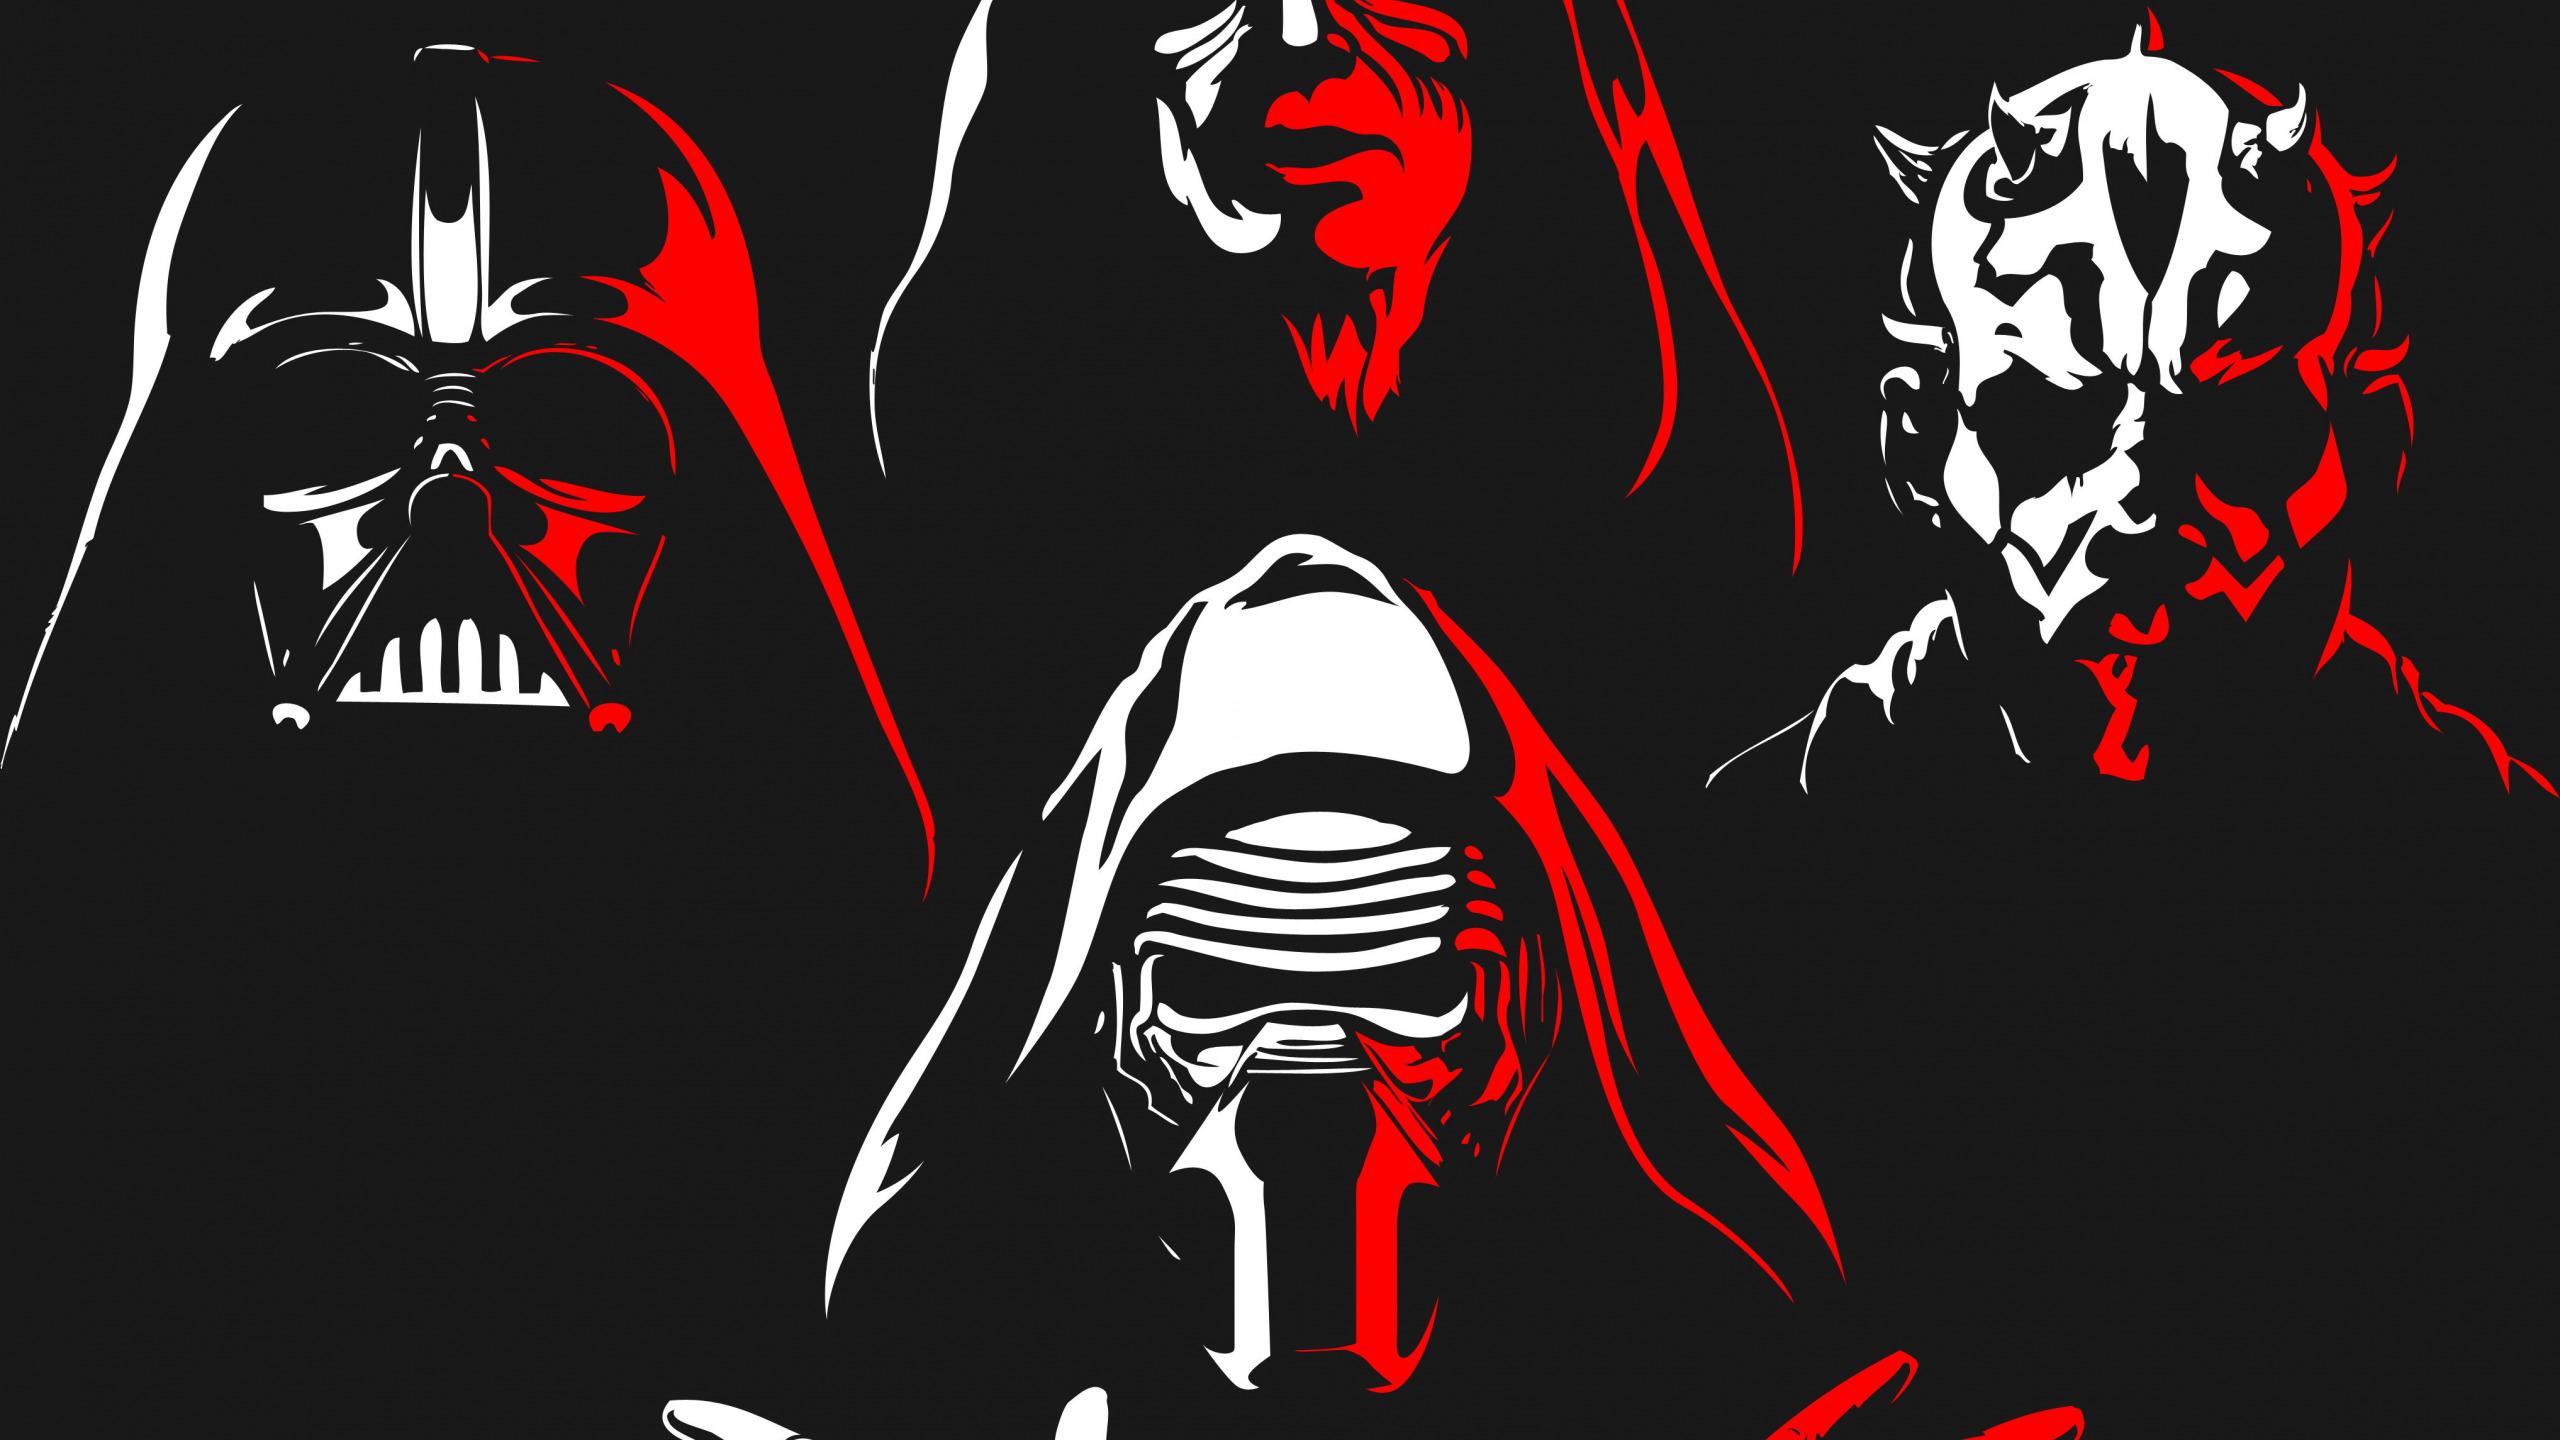 Download Wallpaper Red White Star Wars Darth Maul Darth Vader